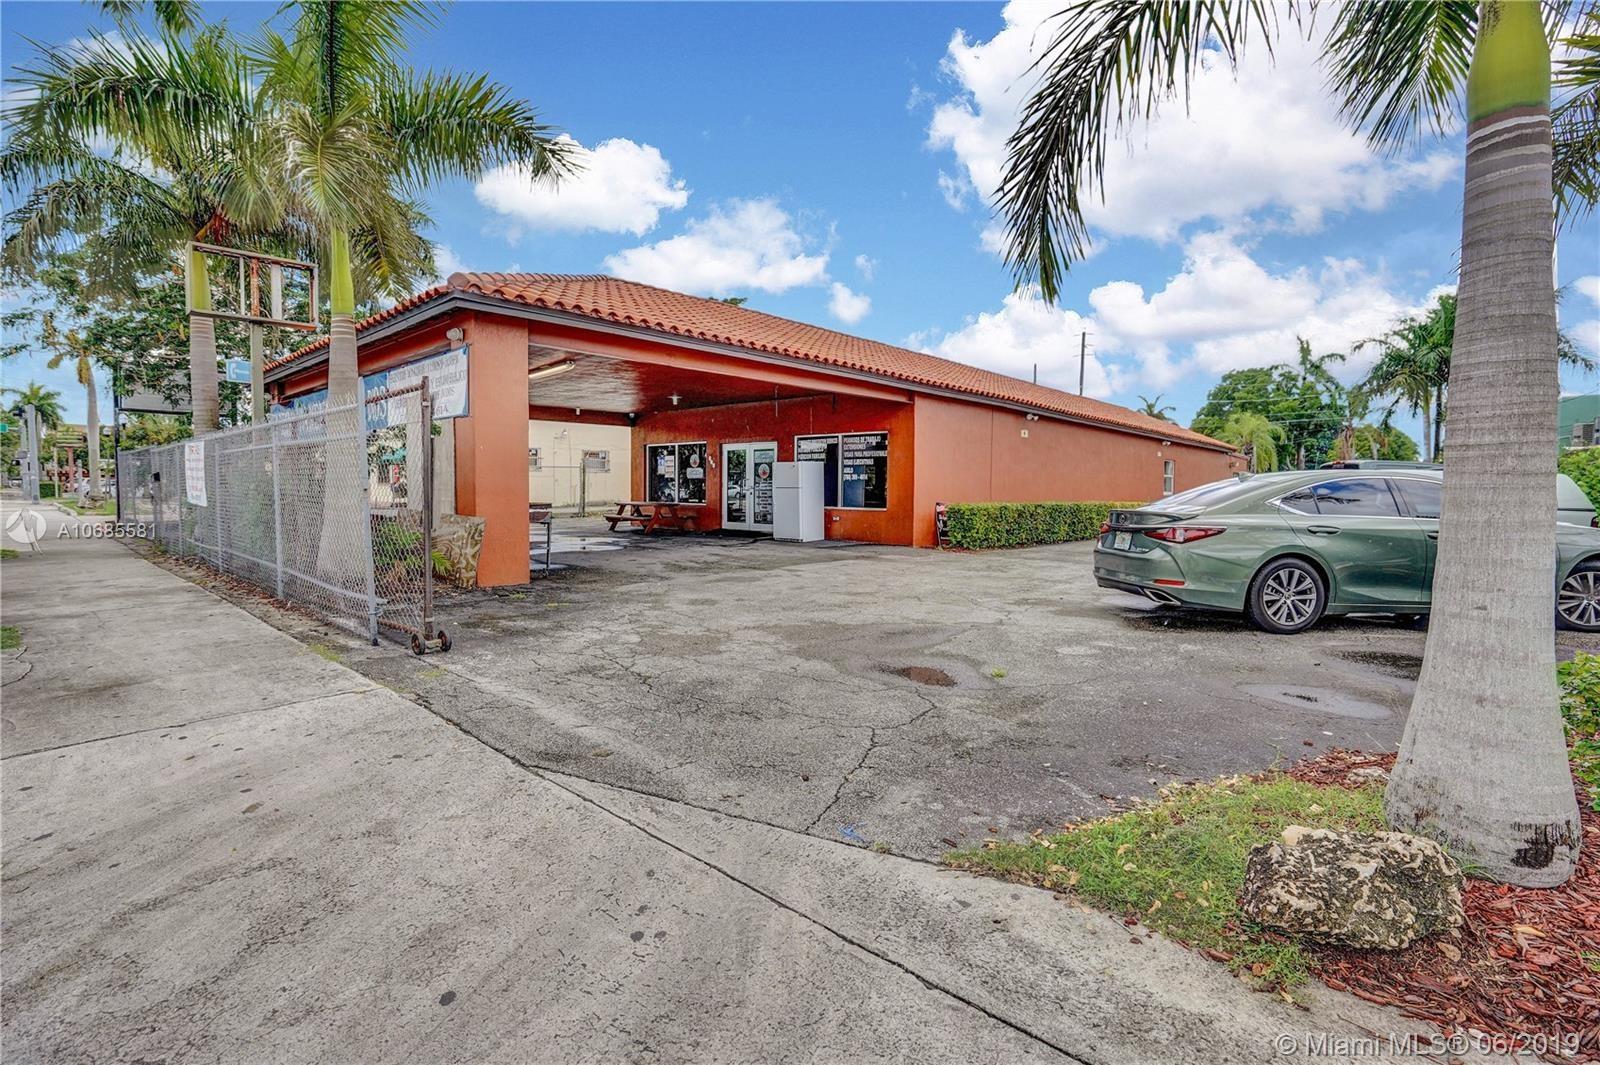 426 N Krome Ave, Homestead, FL 33030